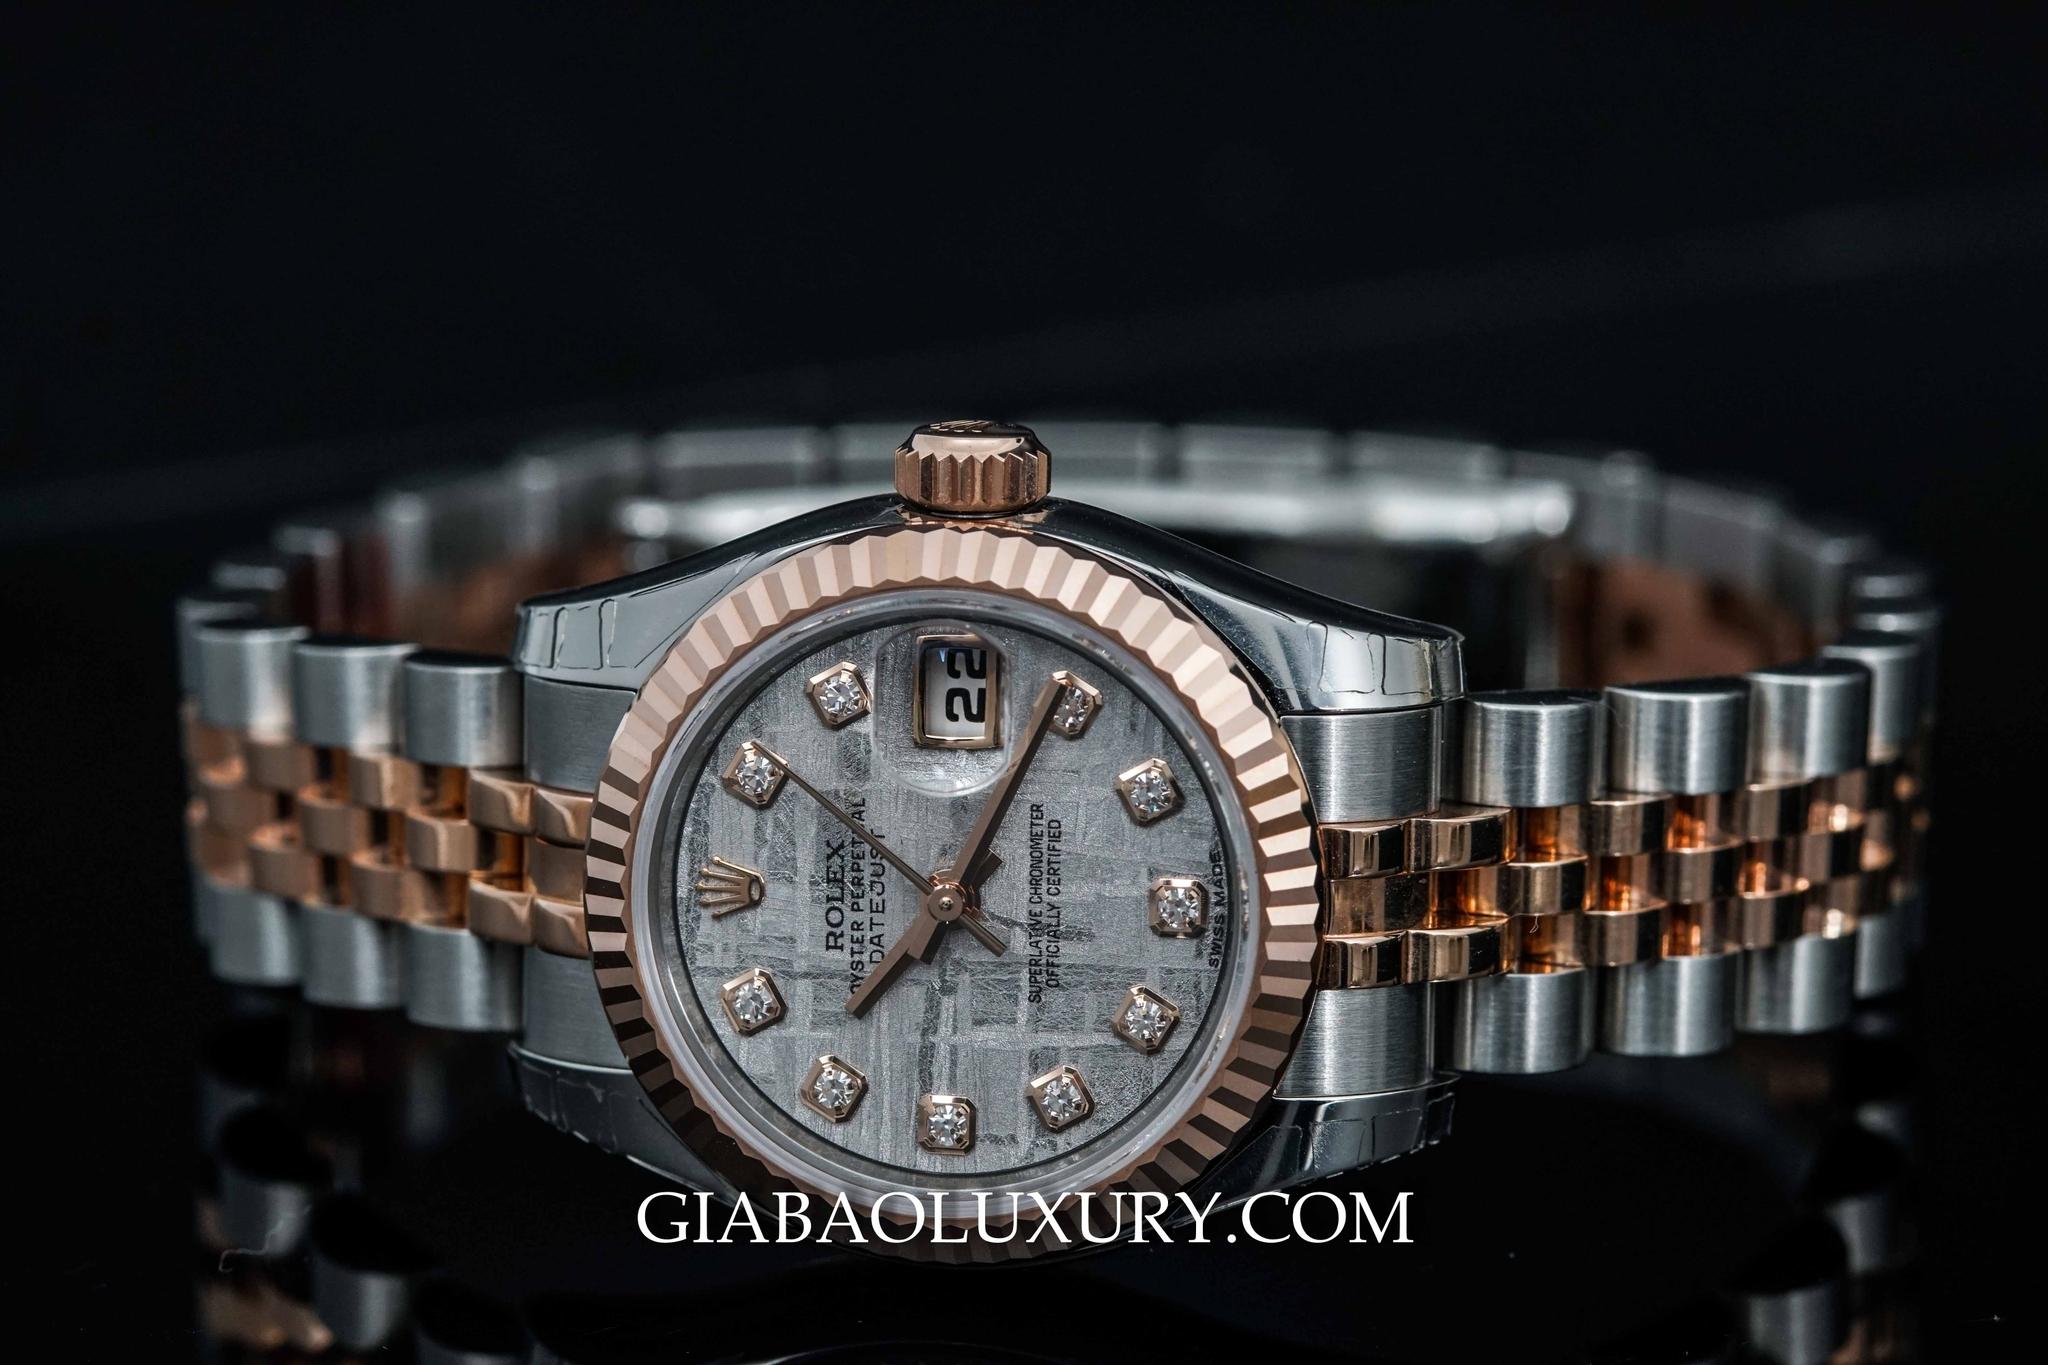 179171 - Rolex Lady Datejust với mặt số nạm kim cương